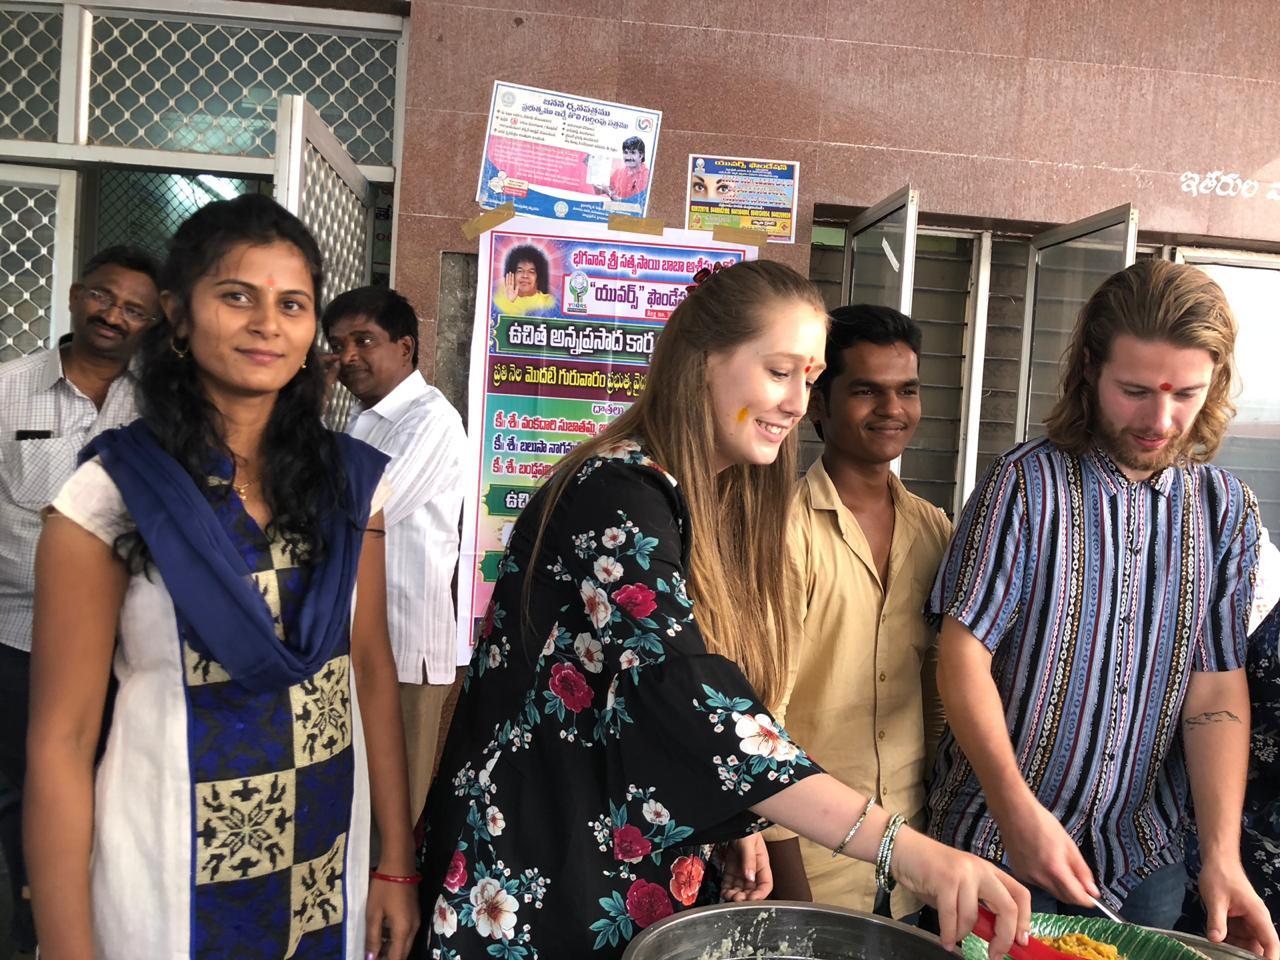 India – Week 4, Part 1: Dharmavaram and on Doing Good